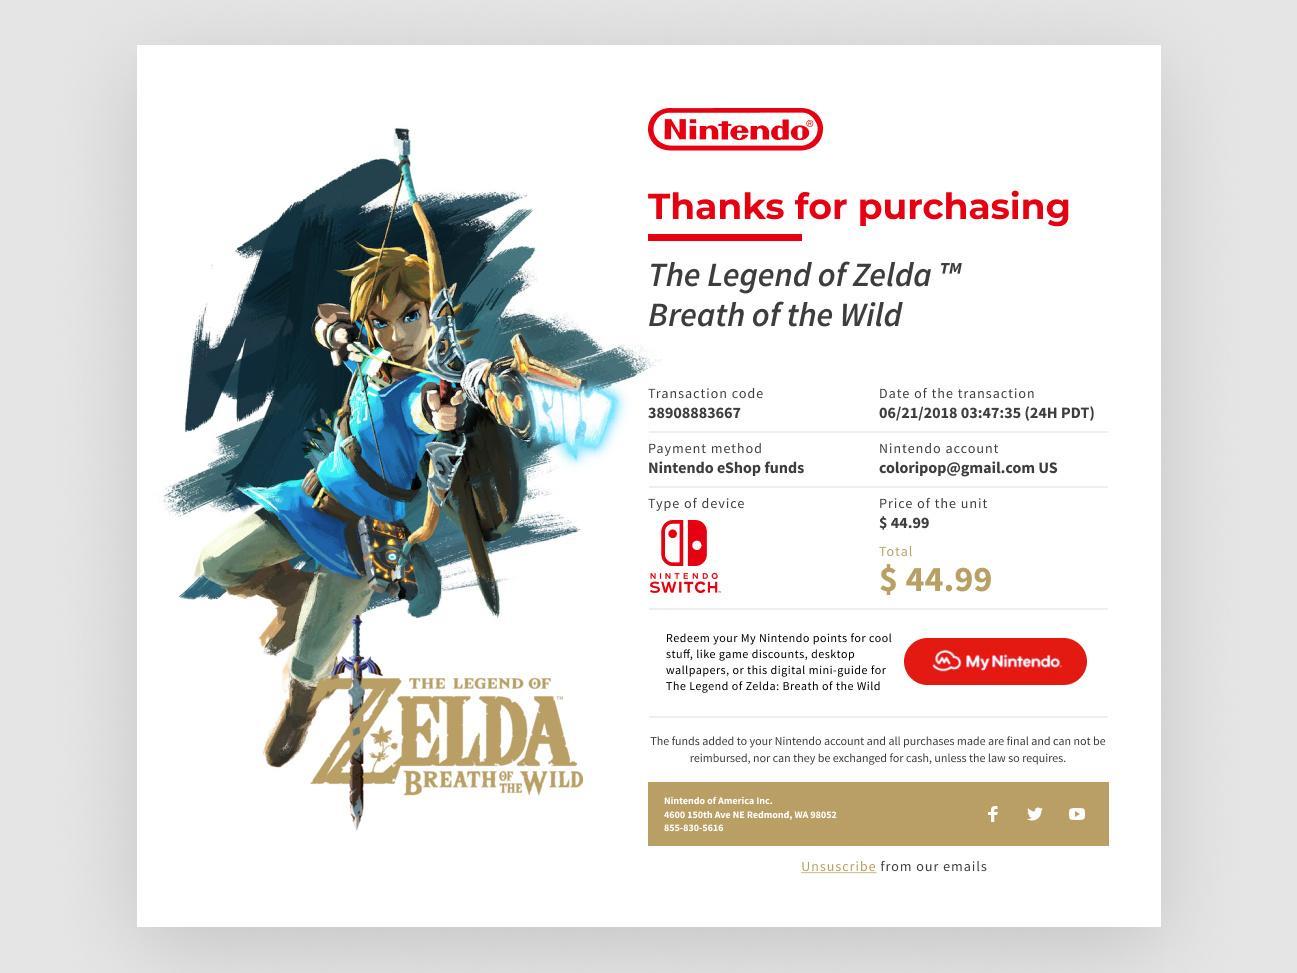 Legend of Zelda purchase confirmation email